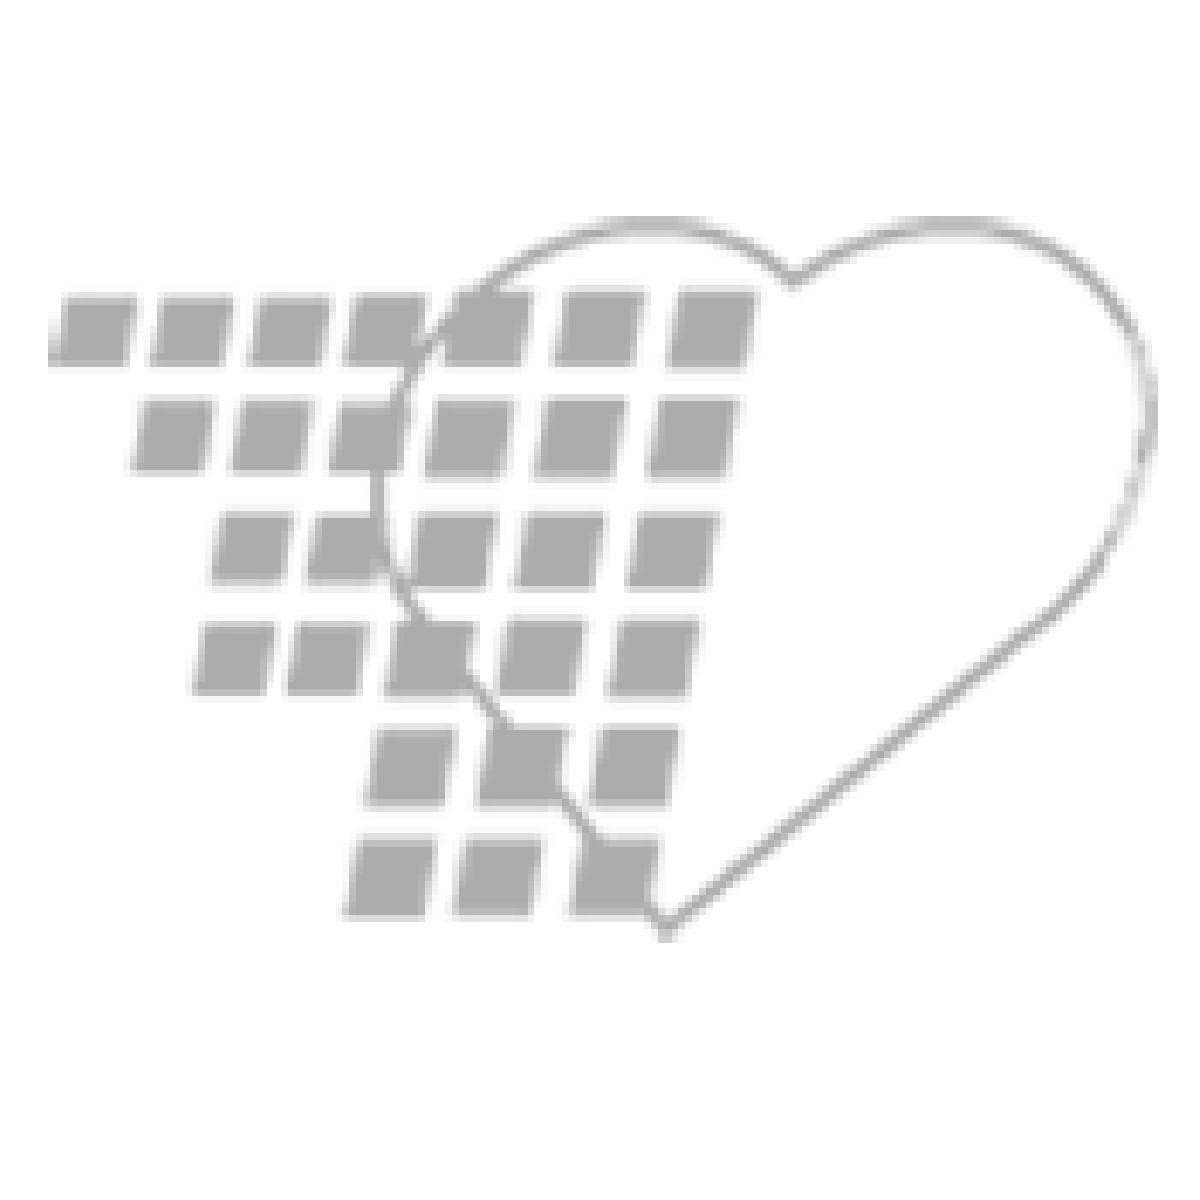 11-81-0050 Laerdal Nursing Anne (Non SimPad Capable)